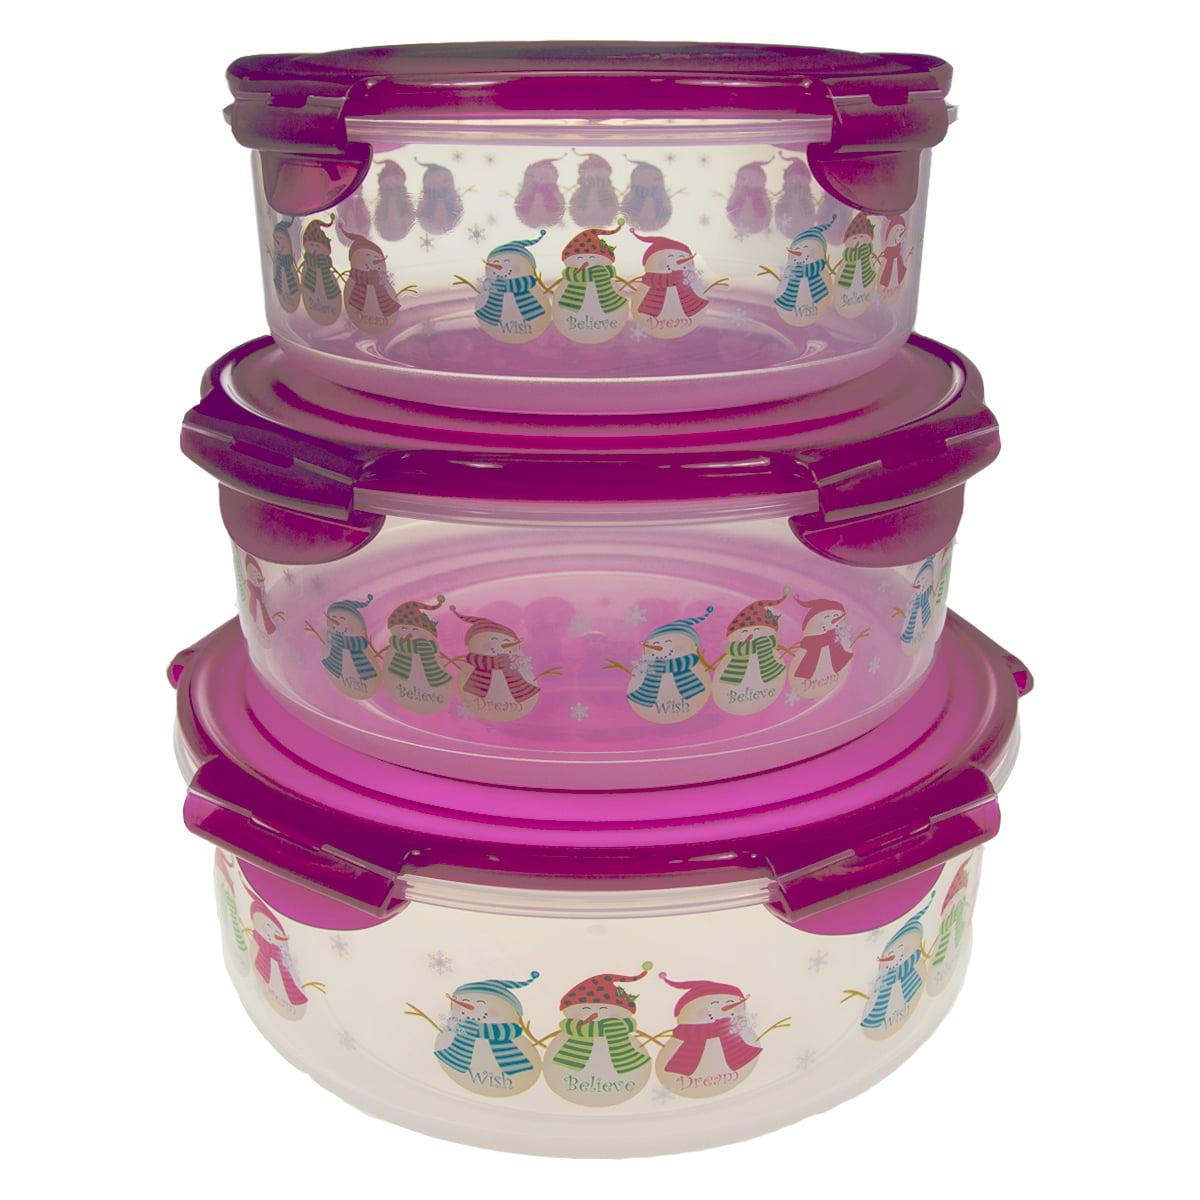 6pc Lock Lock Christmas Plastic Food Storage Containers Set